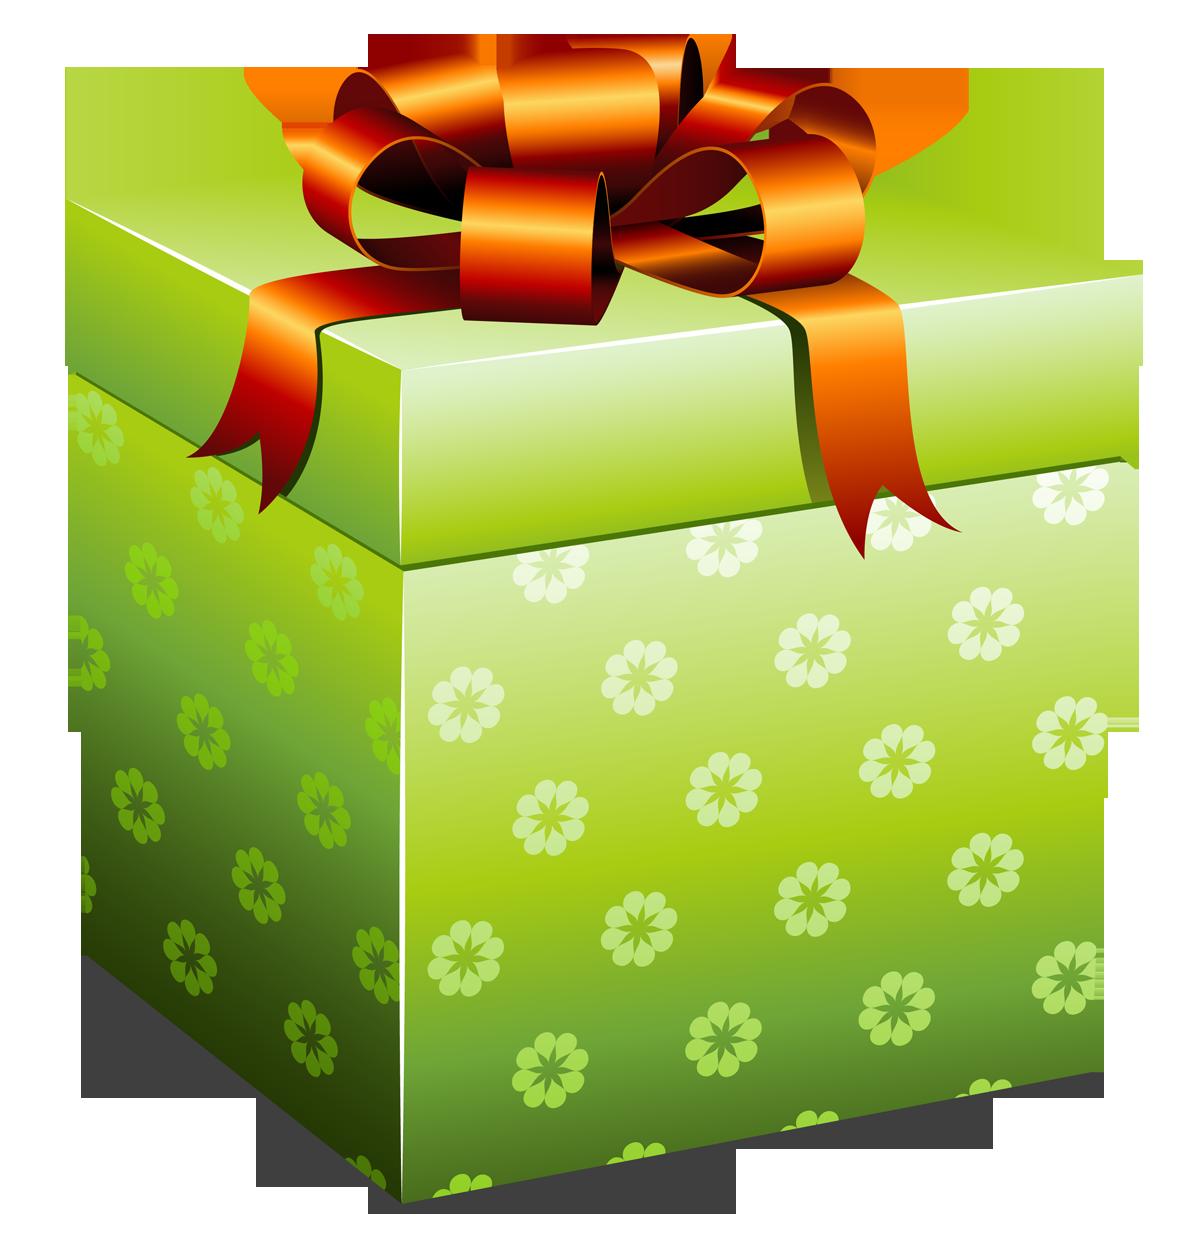 Clipart present illustration. Gift box fourteen isolated